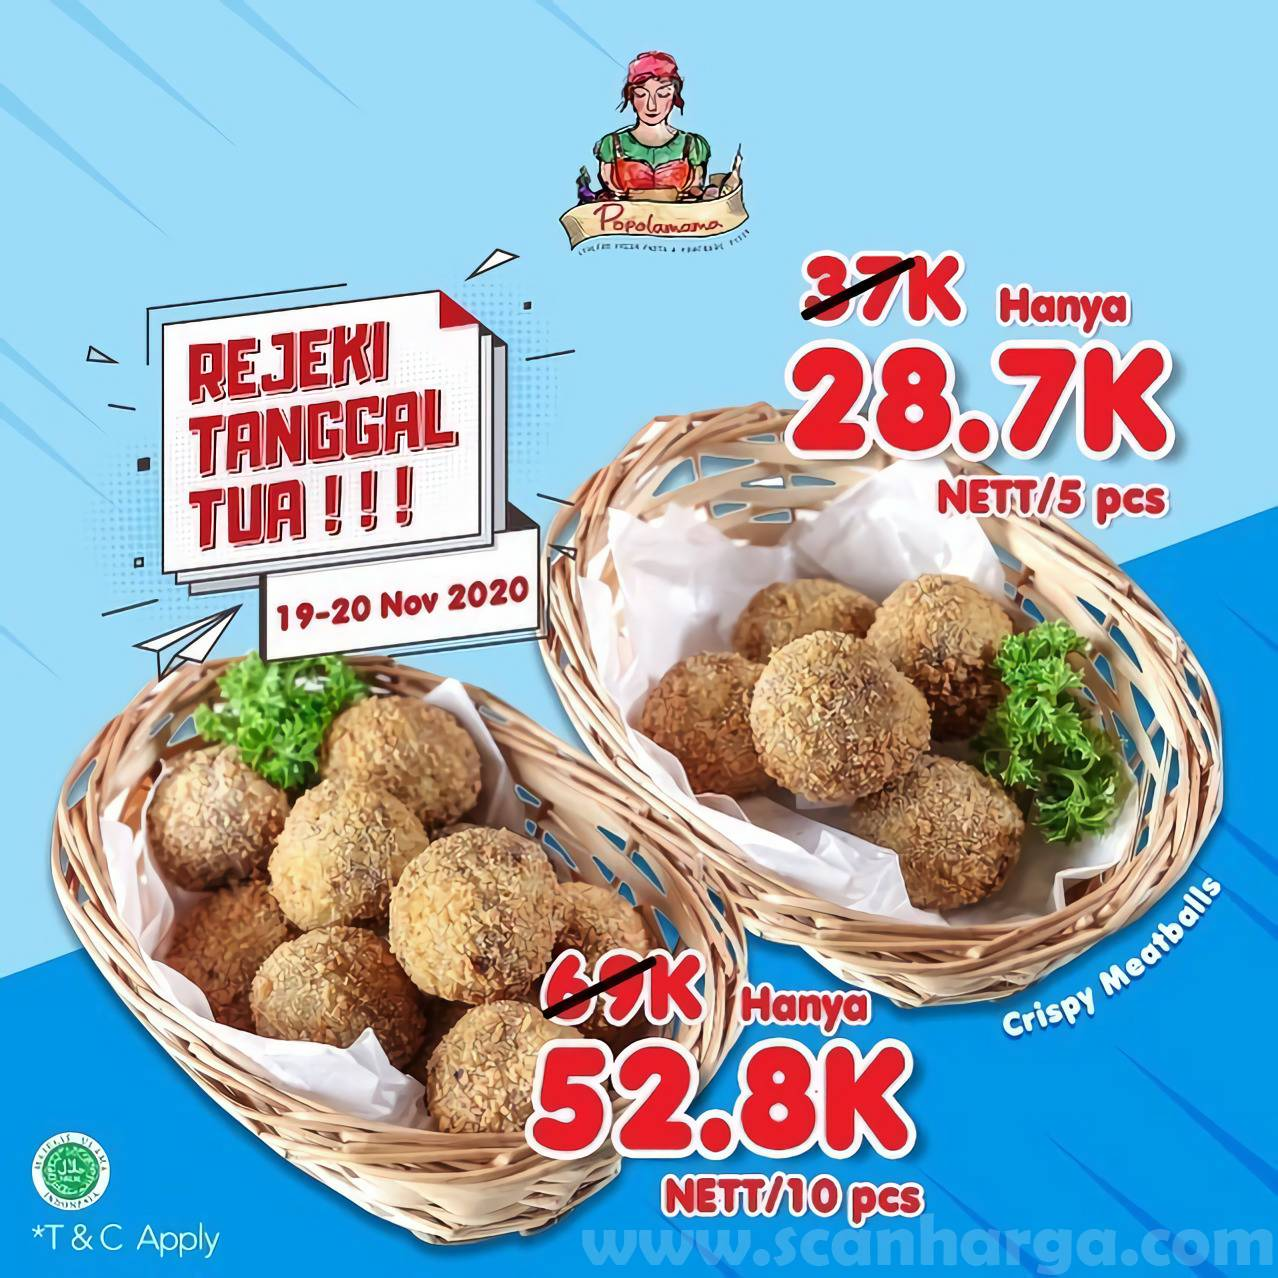 Promo Popolamama Harga Spesial Paket Crispy Meatballs mulai Rp 28.700 nett /5Pcs